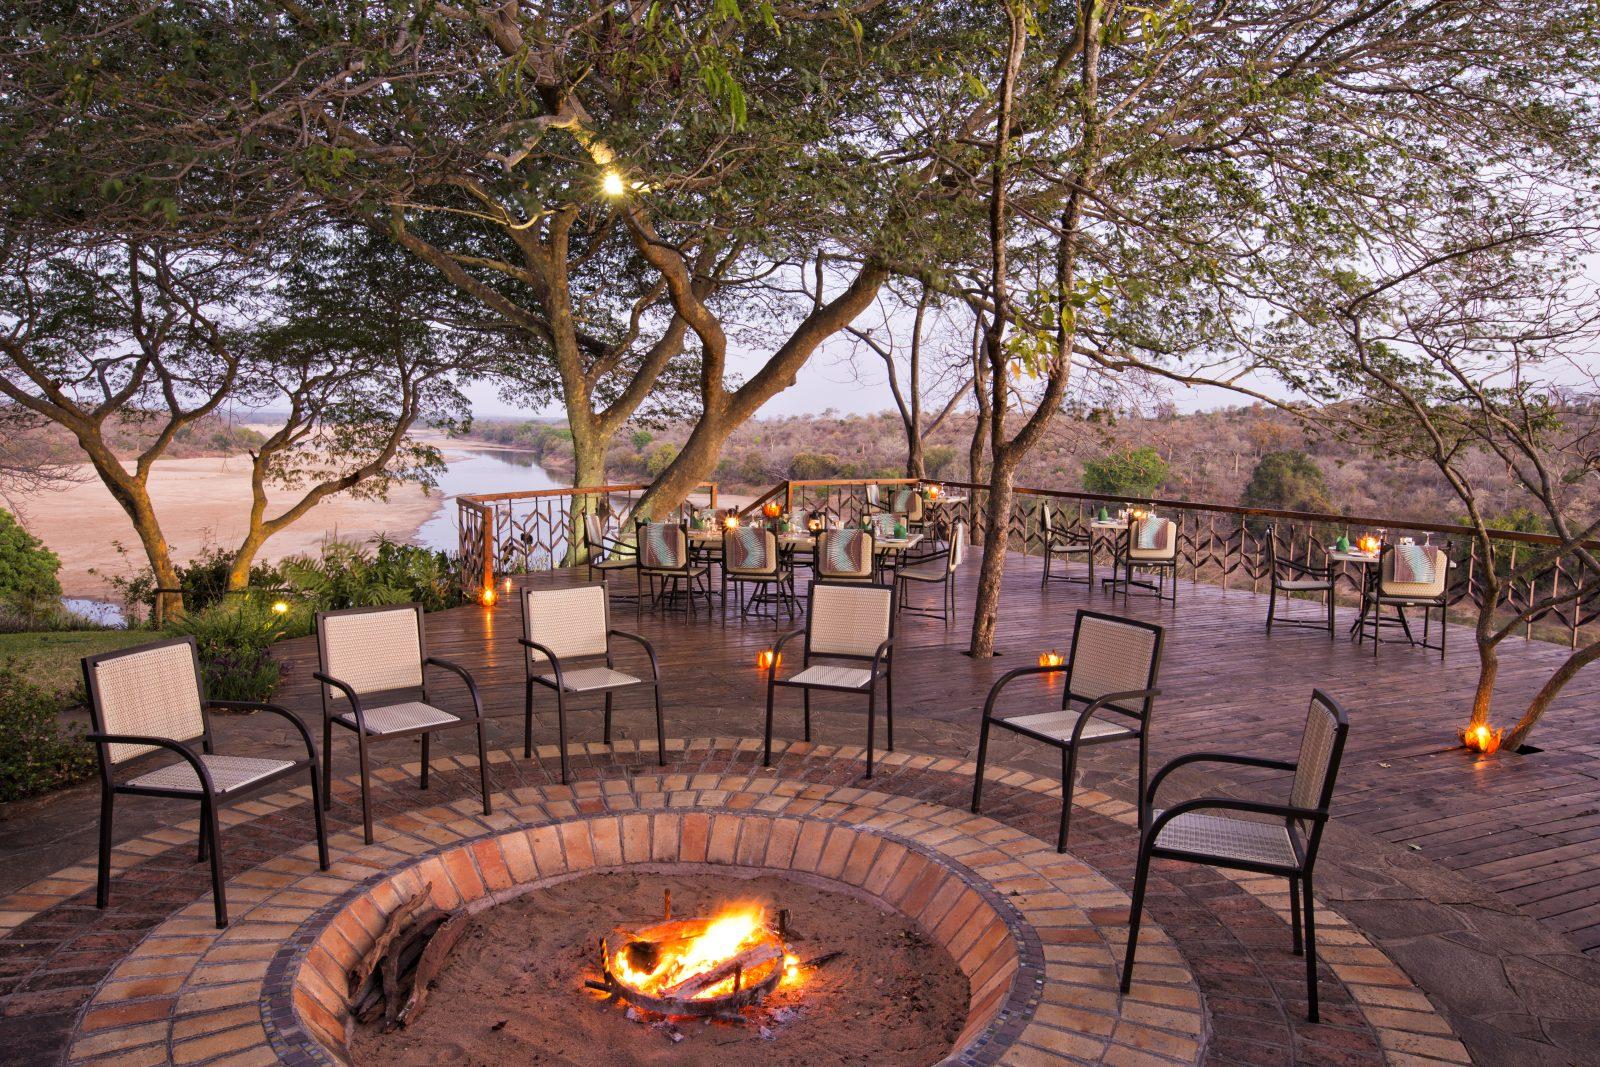 Chilo Gorge Safari Lodge, Gonarezhou, Zimbabwe